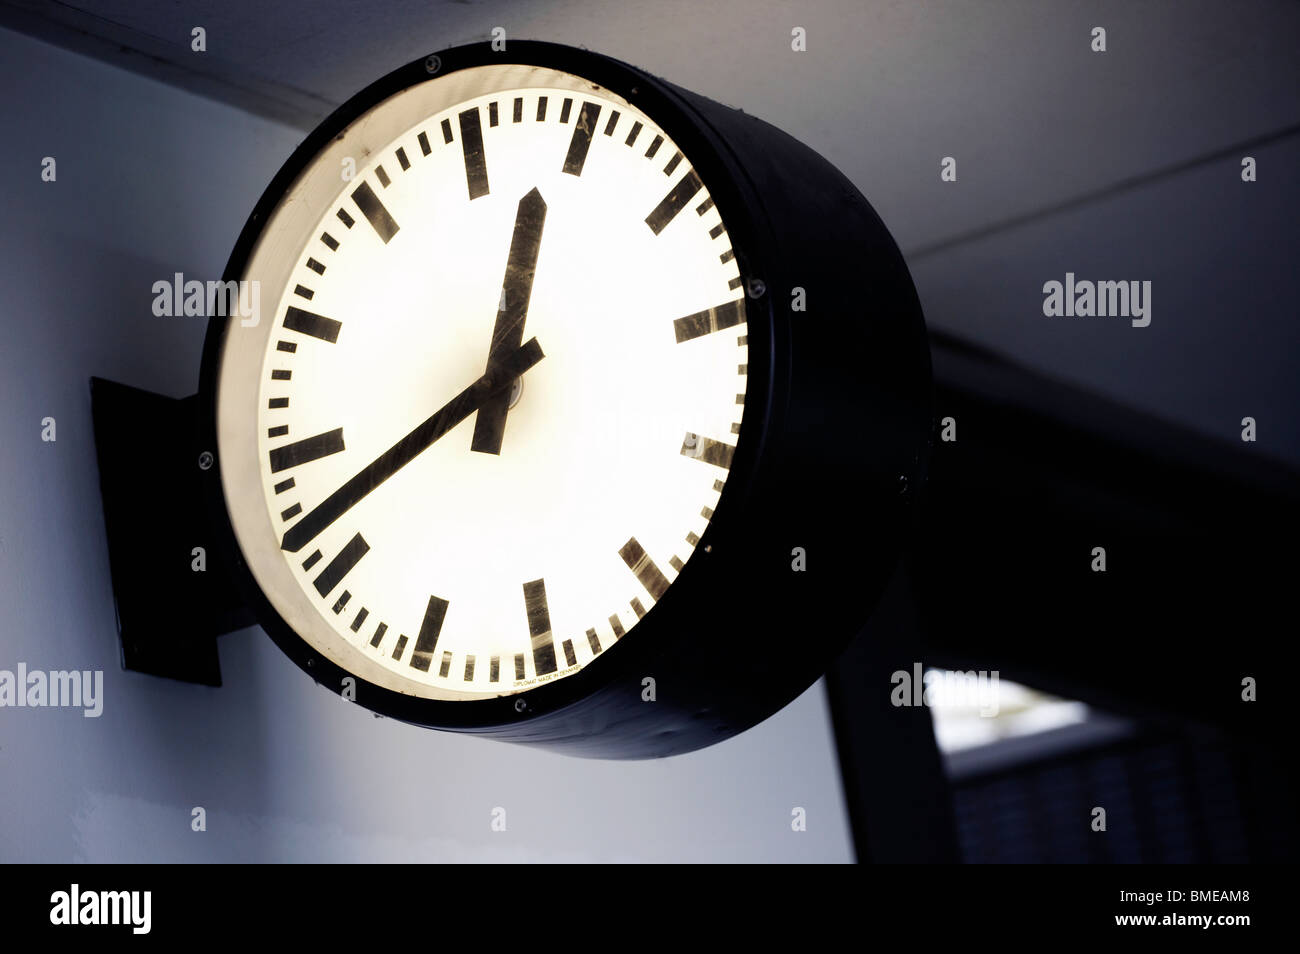 Nahaufnahme der Uhr am Bahnhof Stockbild